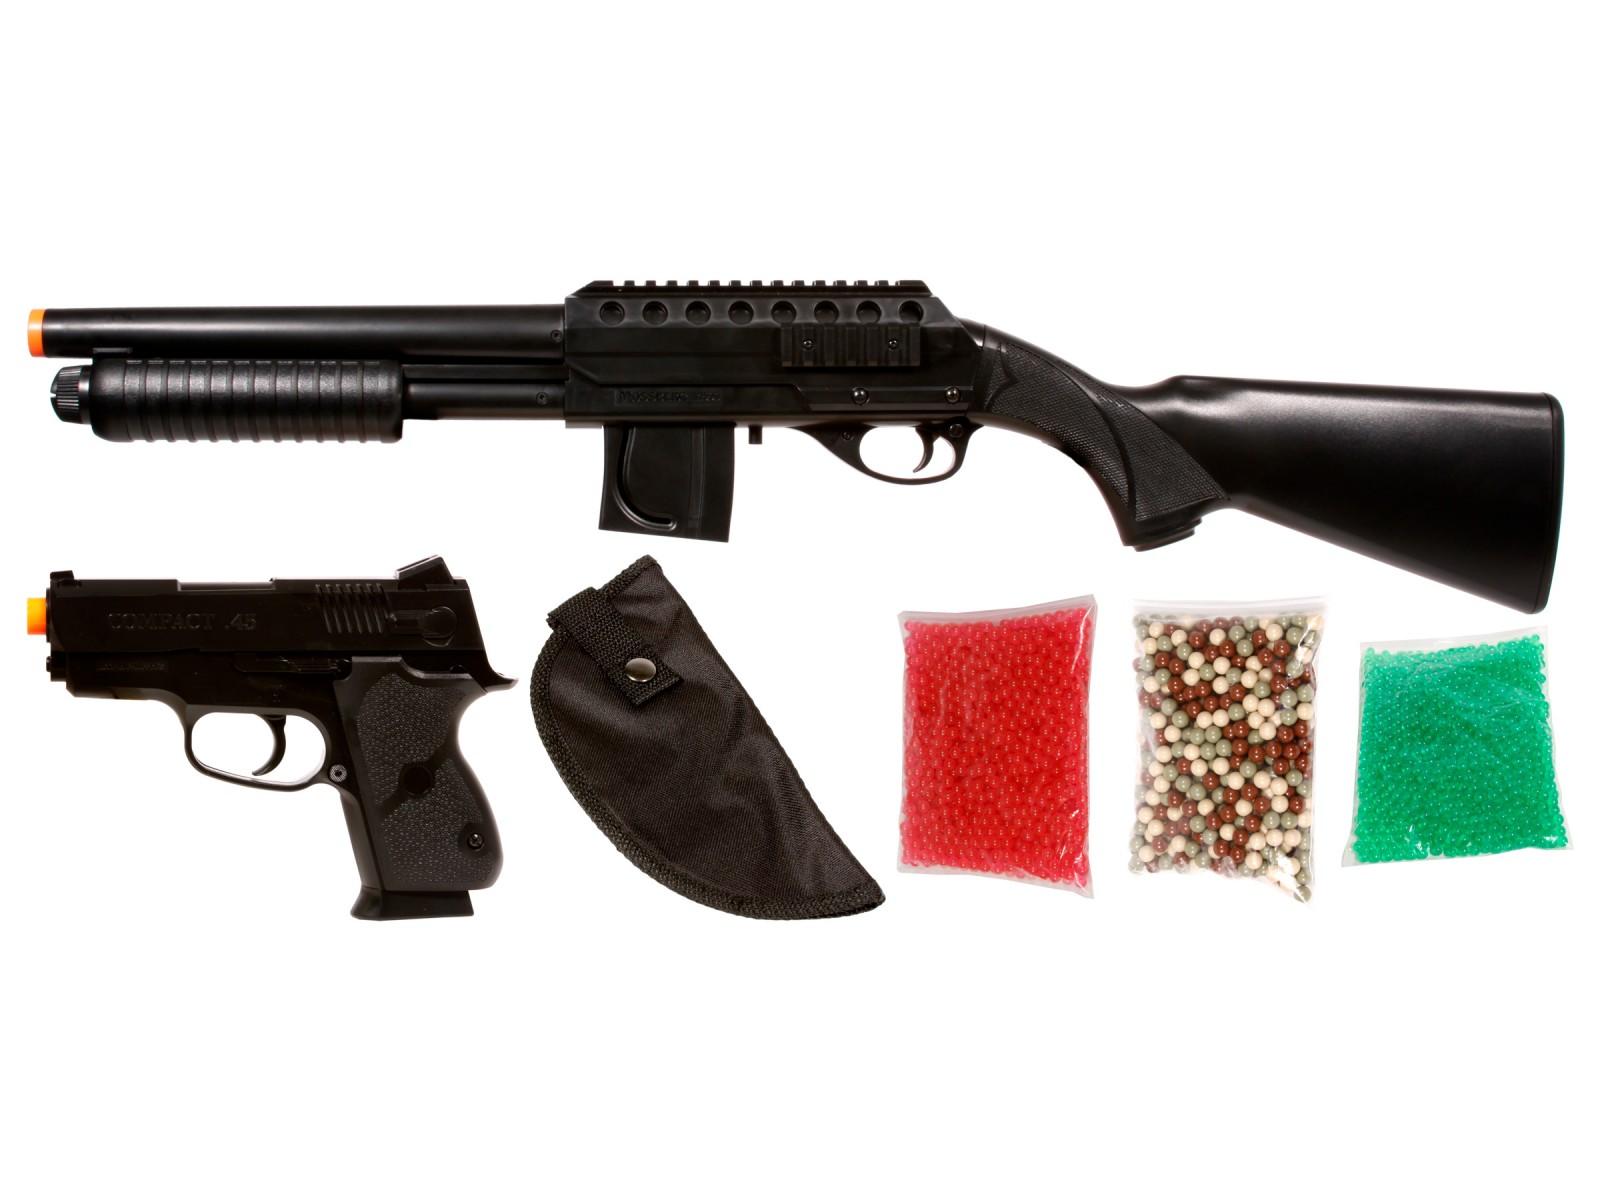 Mossberg_Tactical_Airsoft_Shotgun_Kit_Full_Stock__6mm